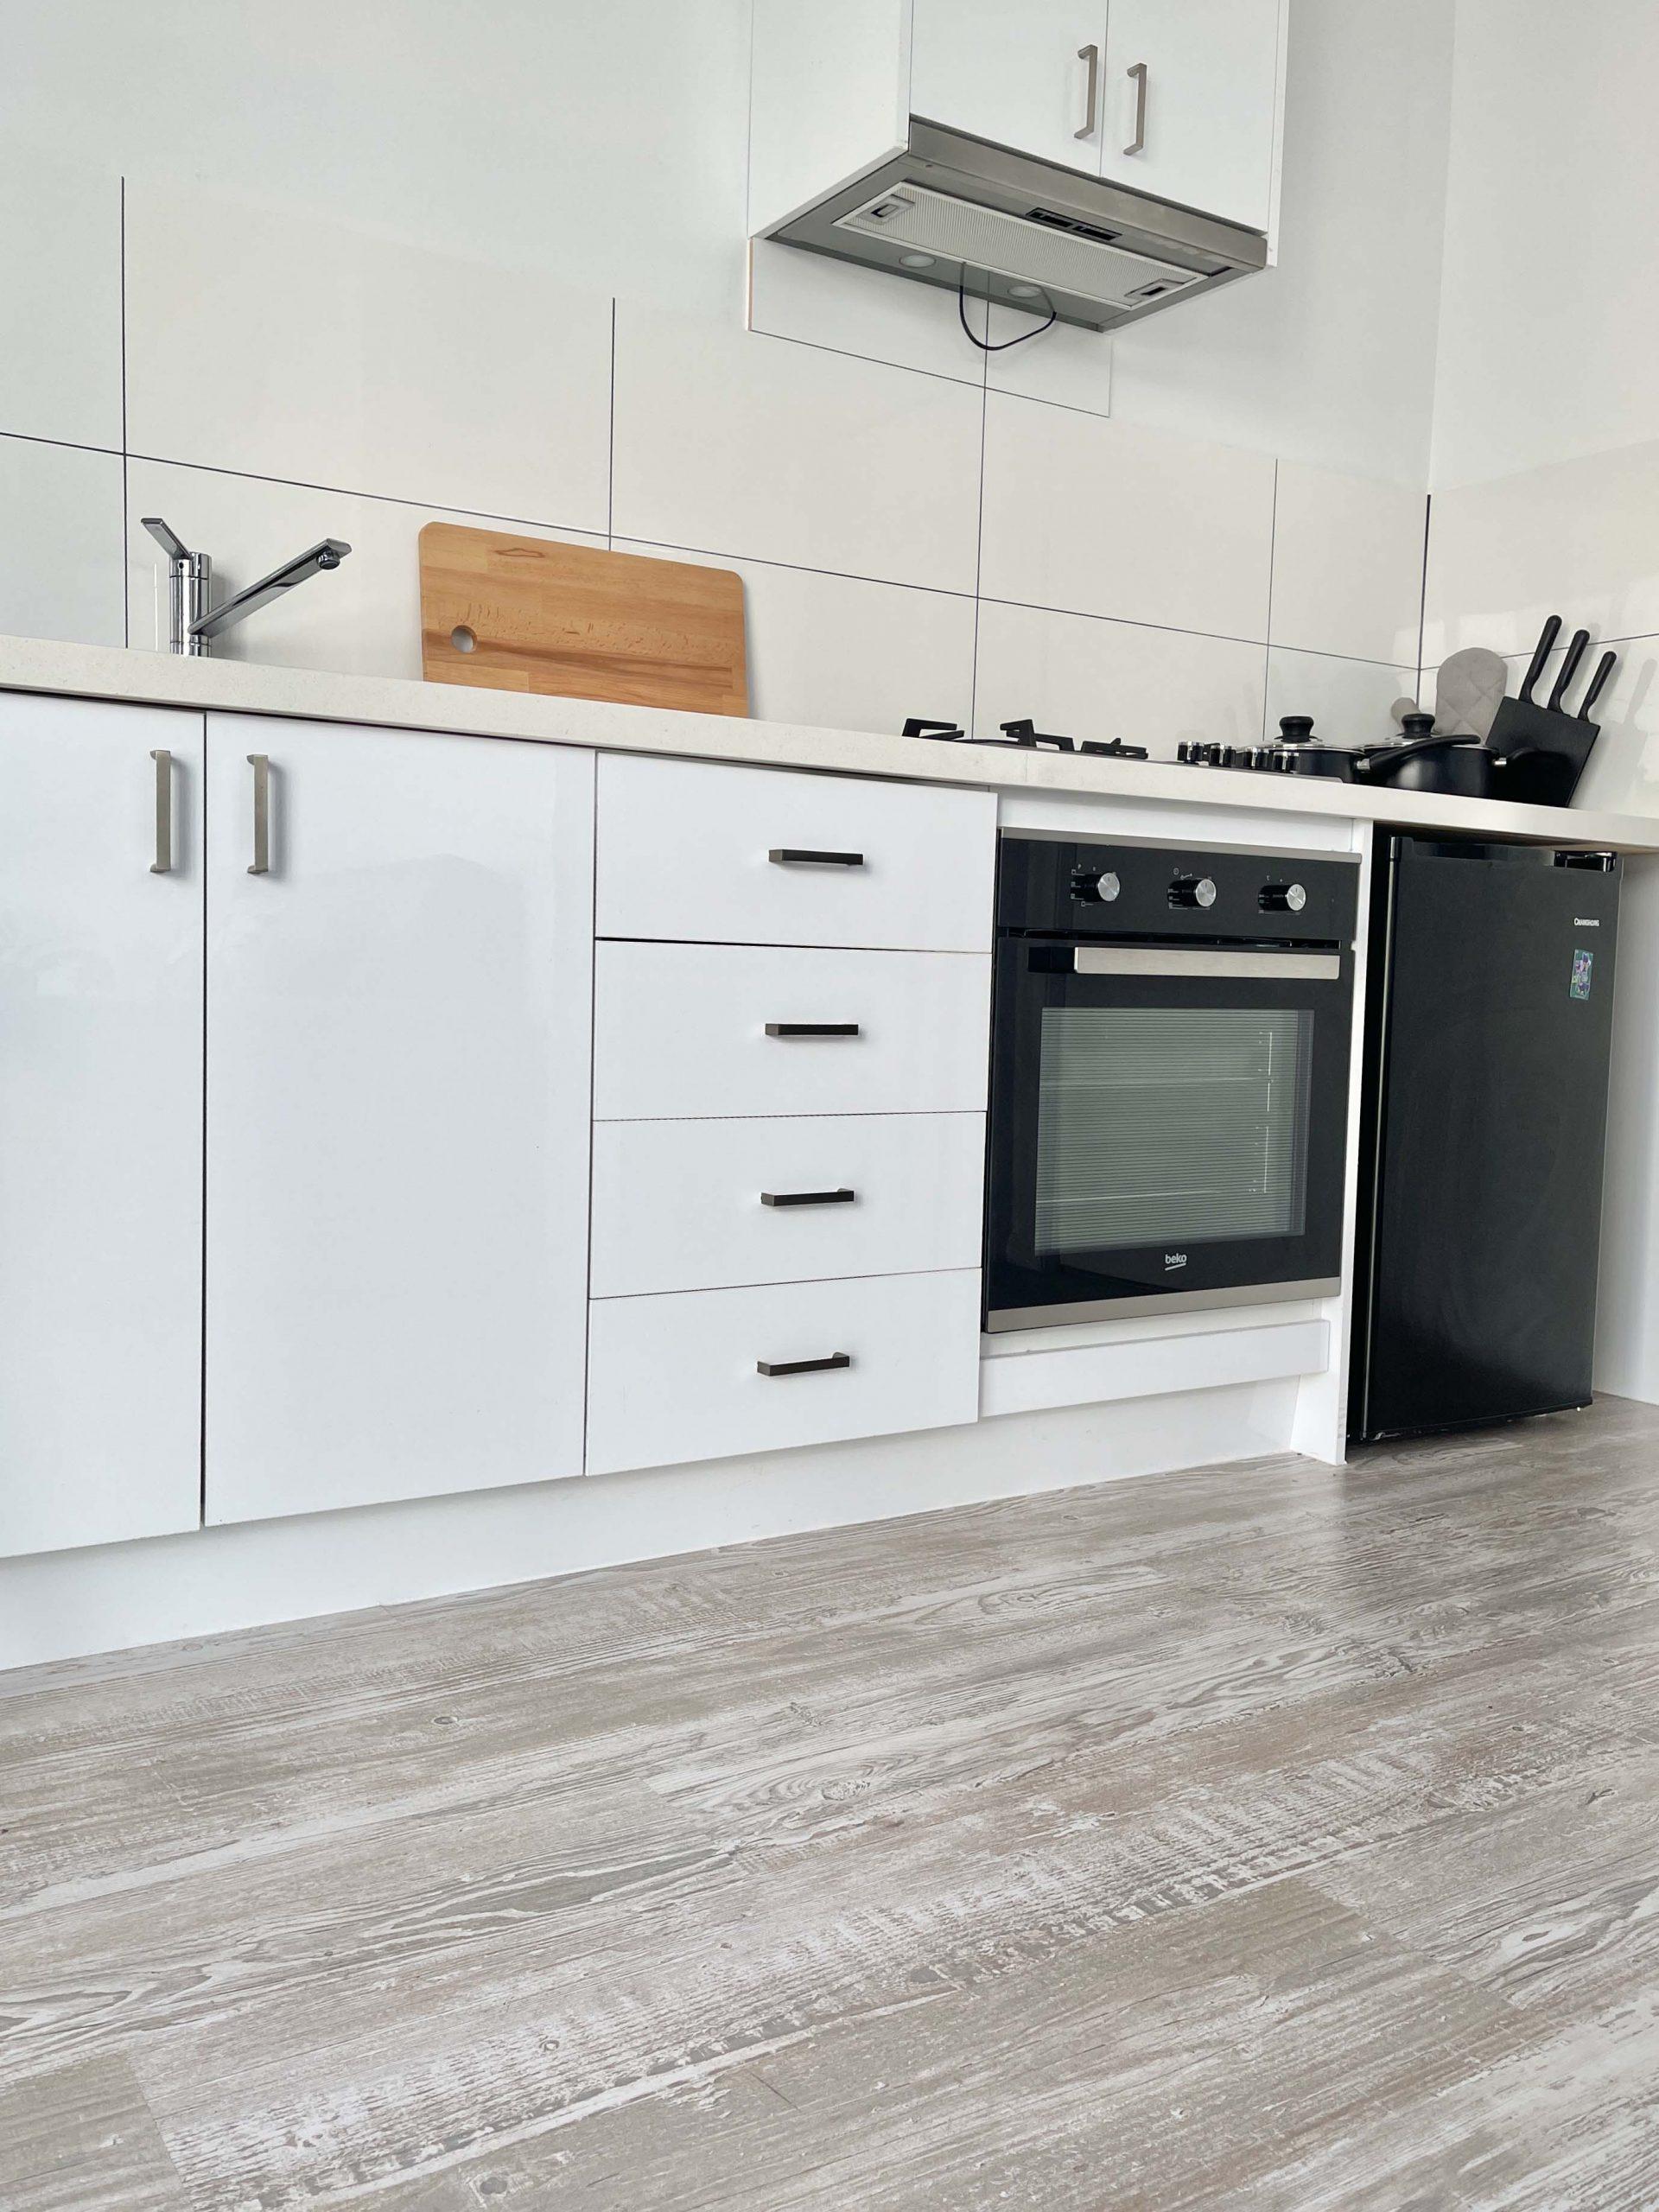 ABS_1BDR_Accessible_Kitchen_B